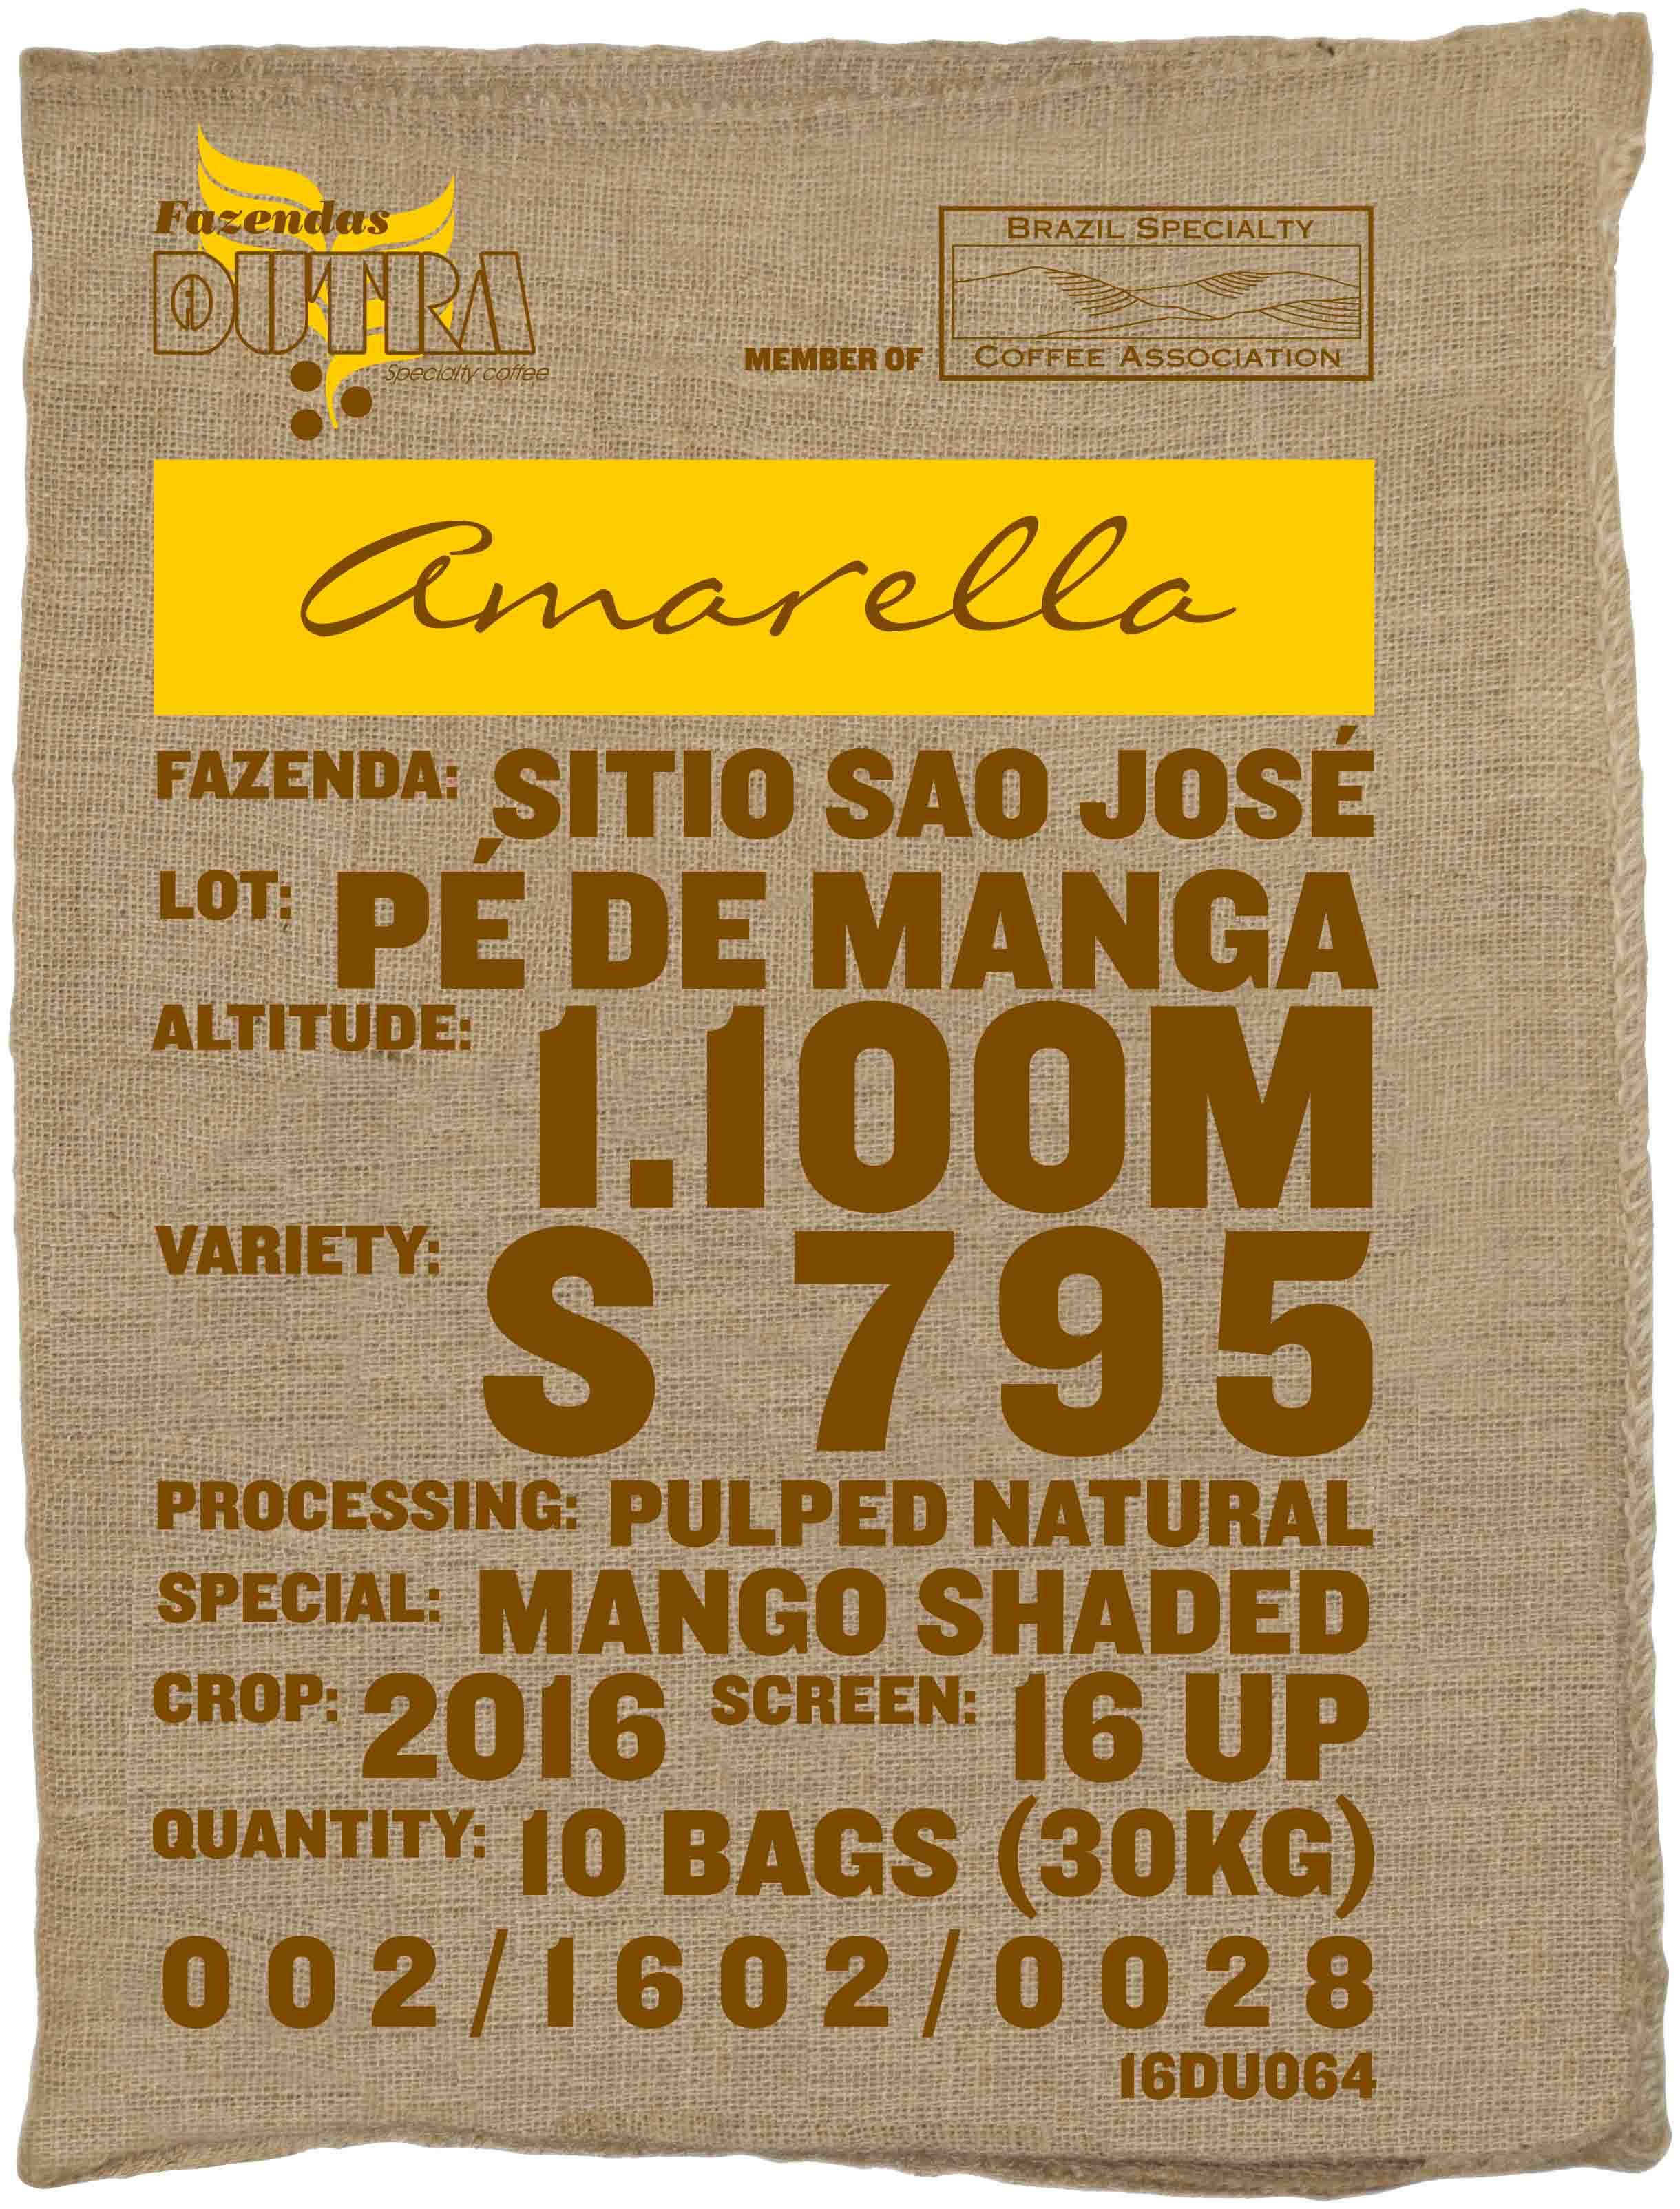 Ein Rohkaffeesack amarella Parzellenkaffee Varietät S795. Fazendas Dutra Lot Pe de Manga.